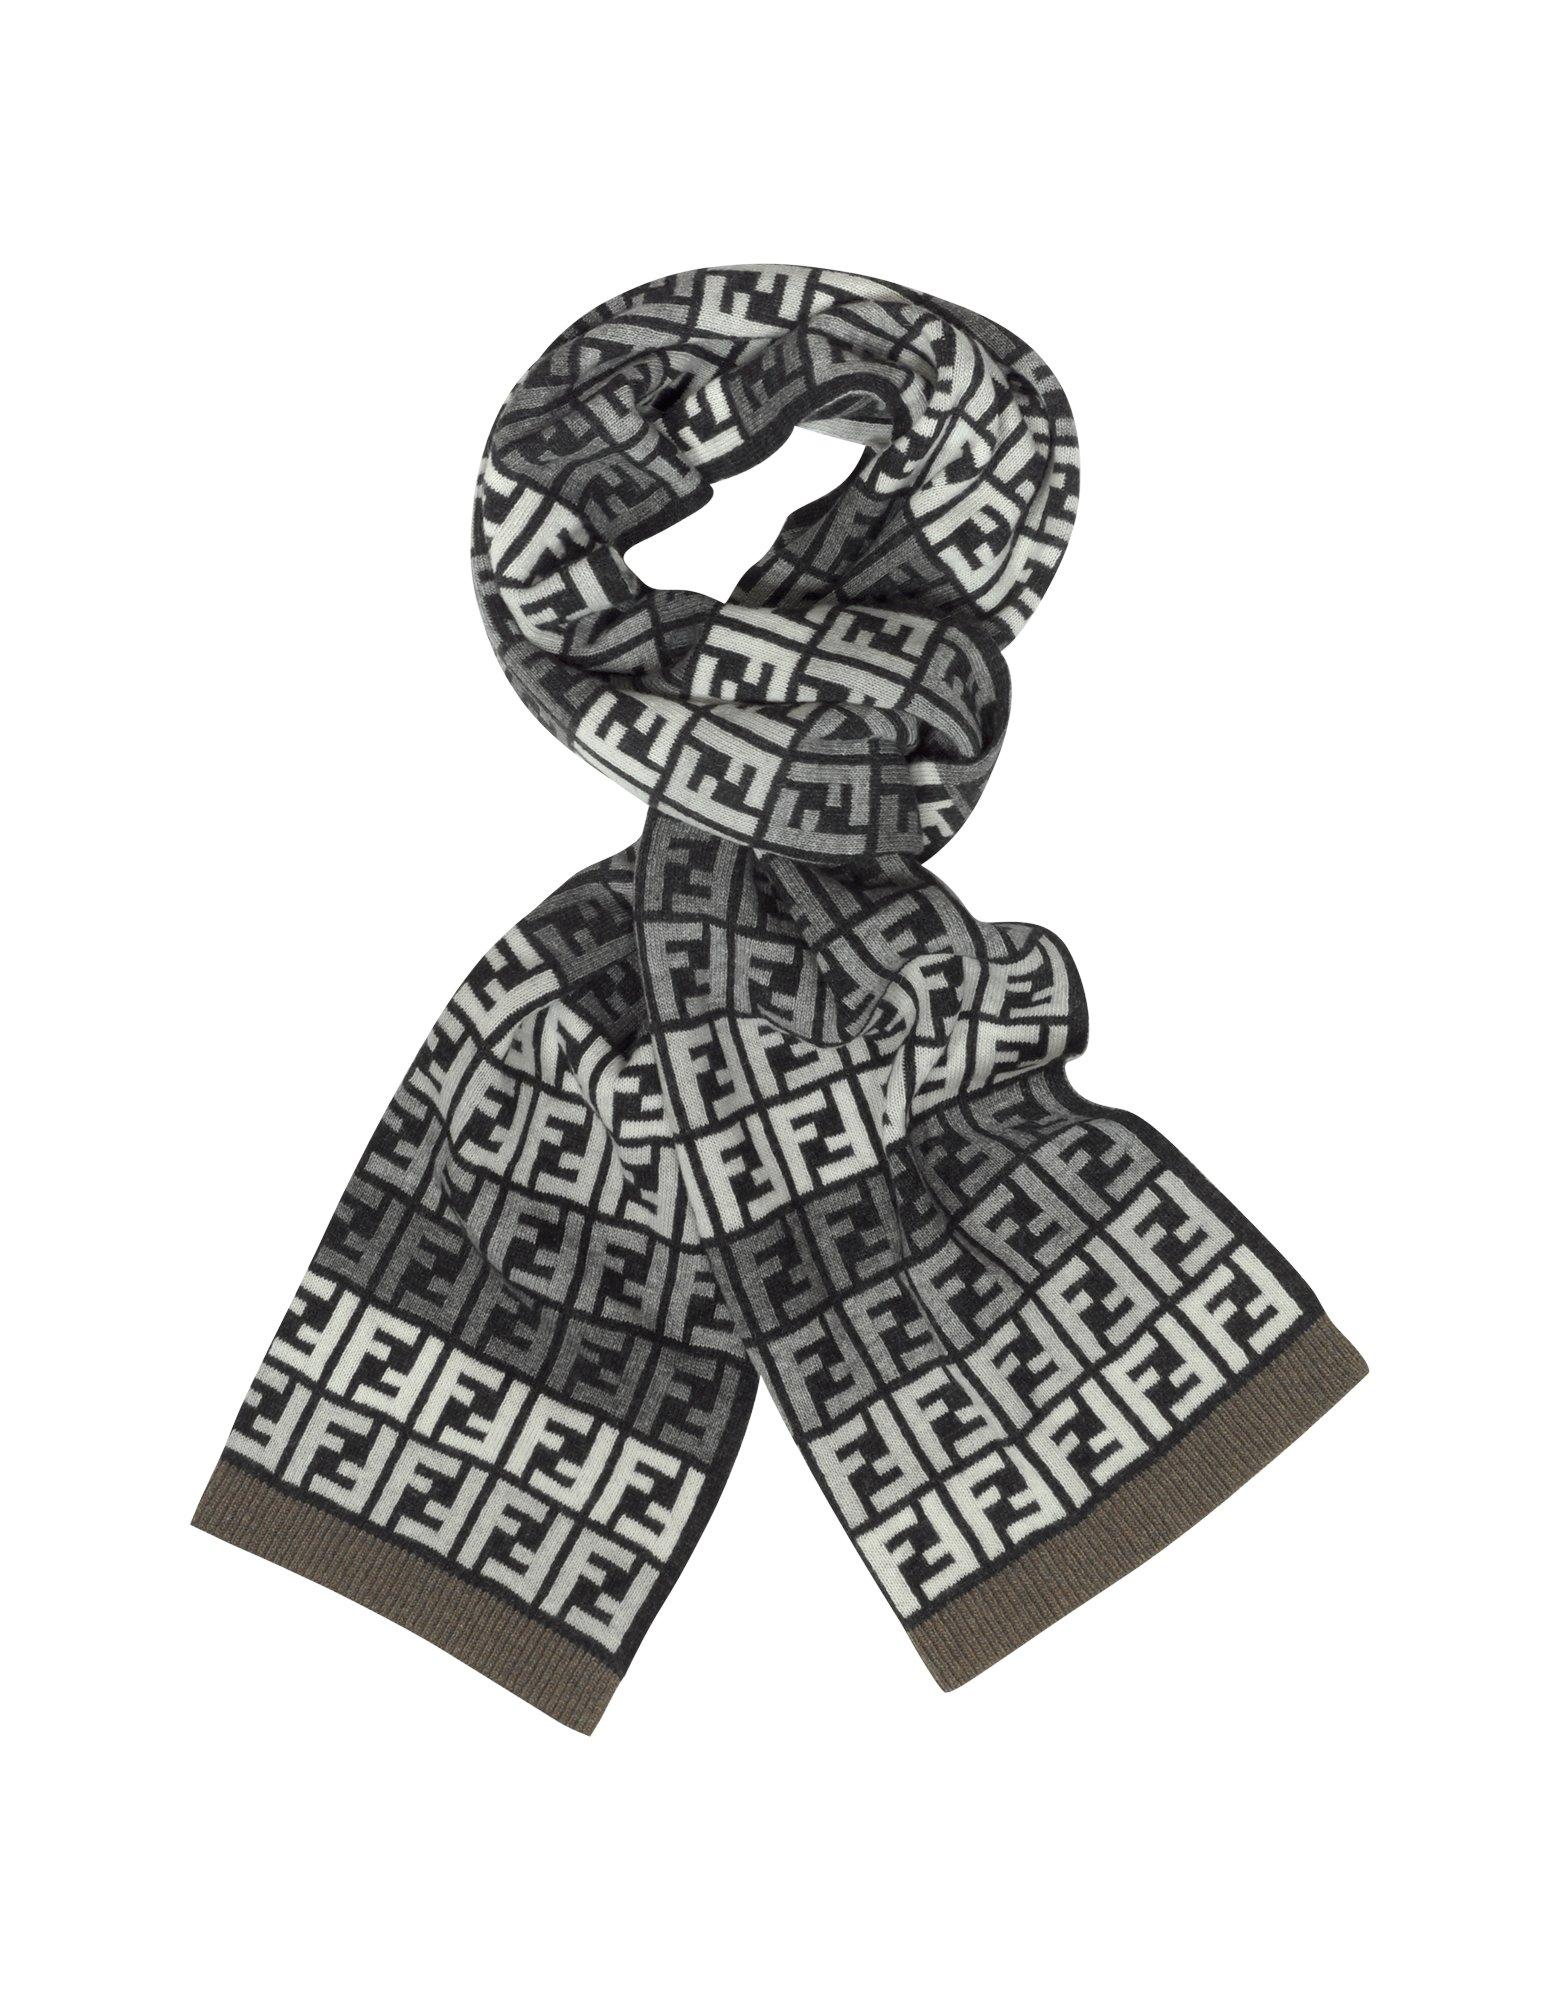 b04c4bb2f cheapest fendi scarf karl urban ffb0e b07b4